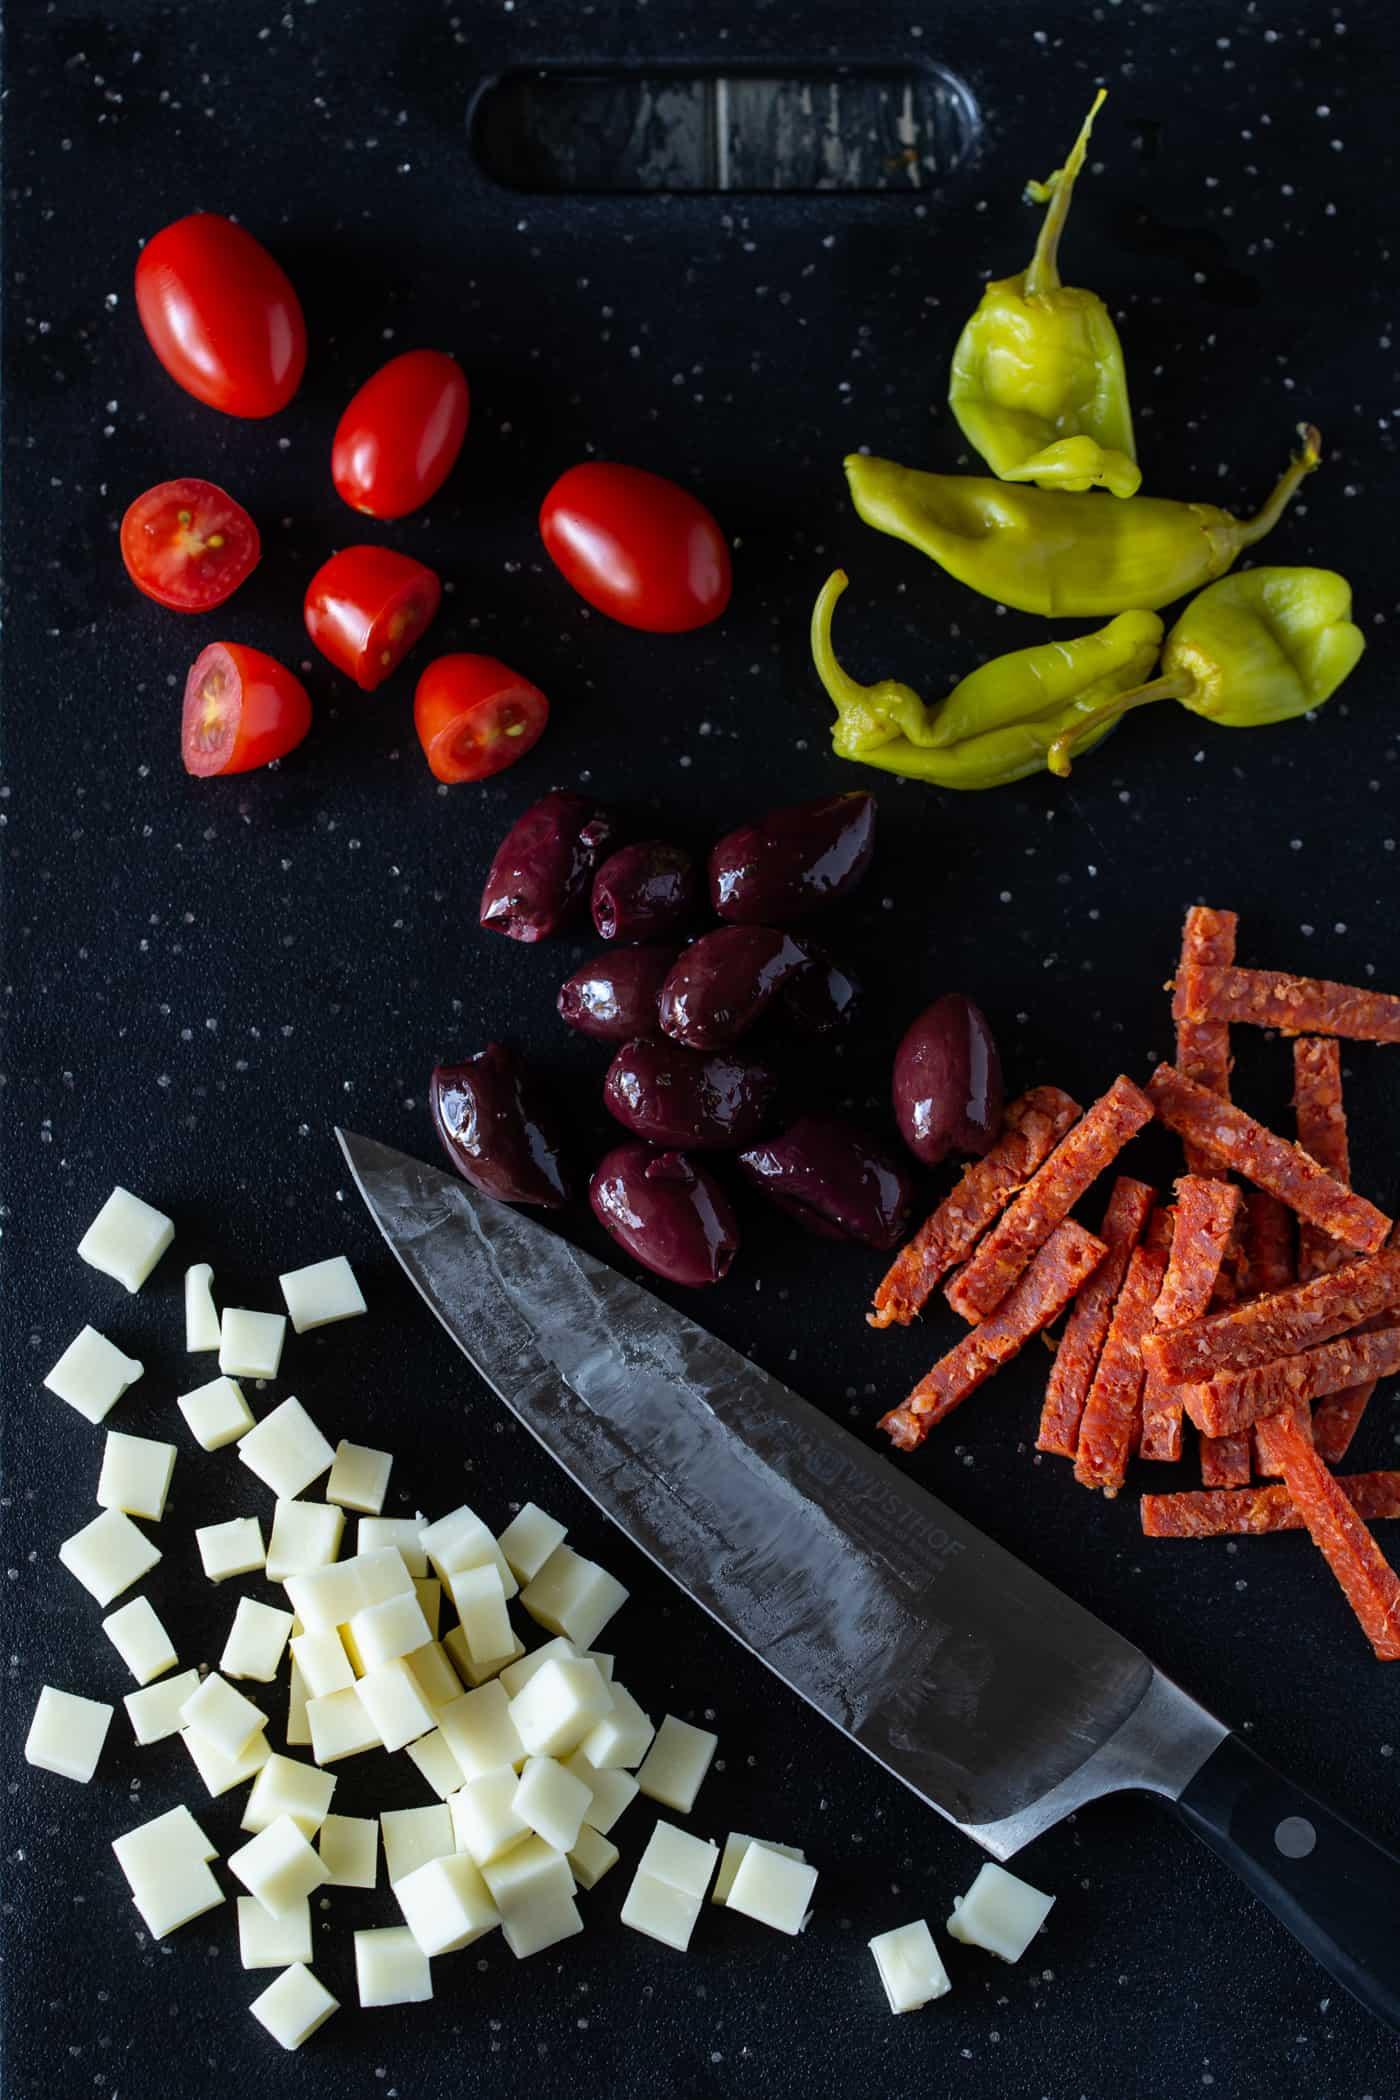 Ingredient shot of antipasto salad on a dark cutting board.